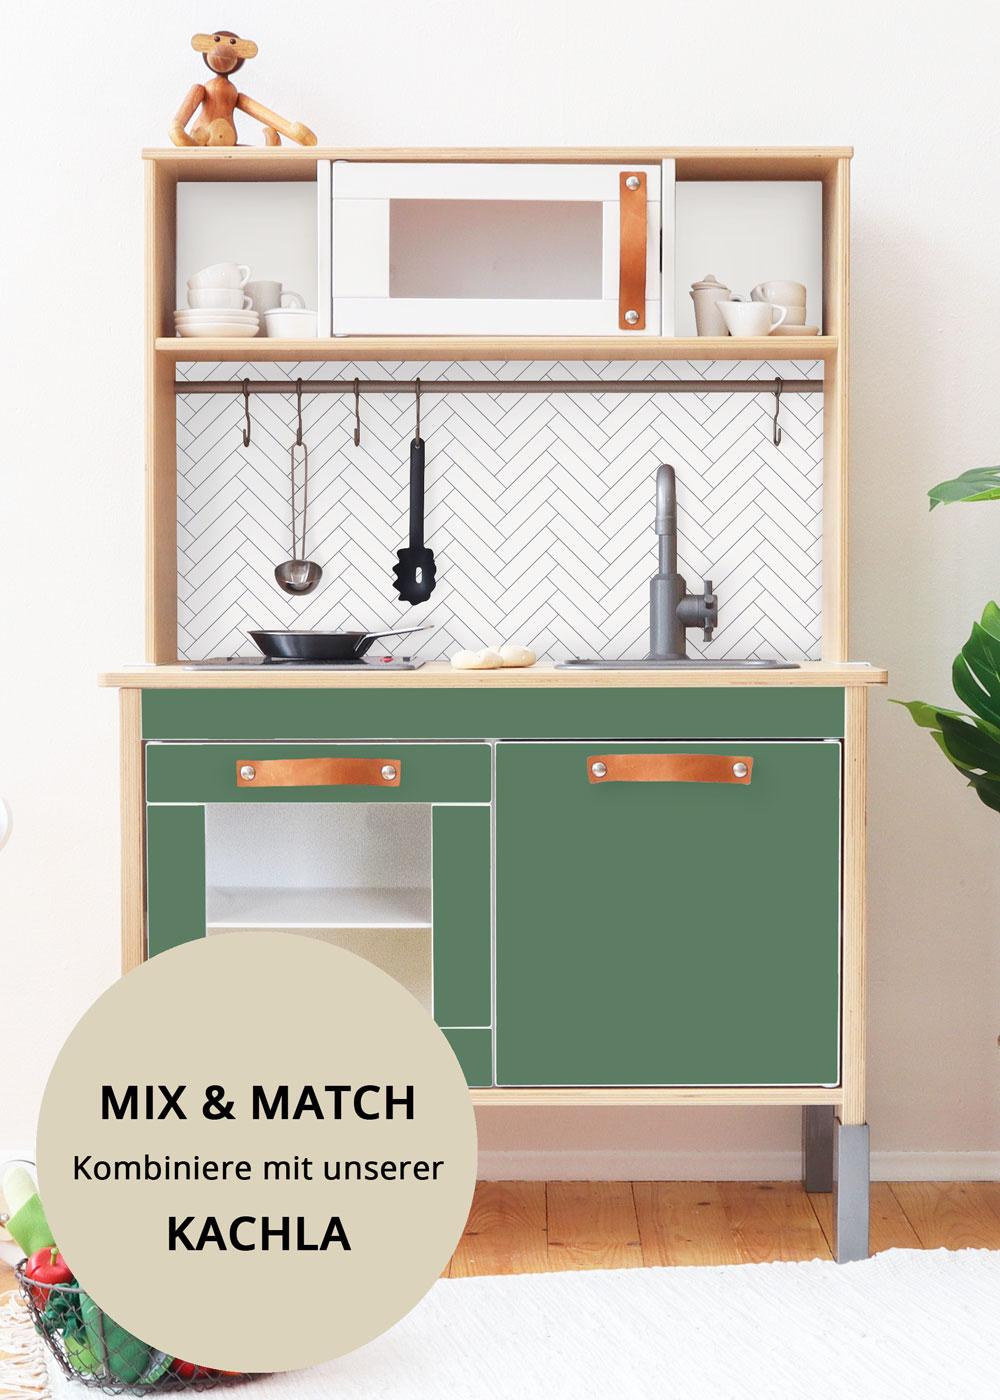 Ikea Duktig Kinderküche Frontli Immergrün Frontansicht schräg oben